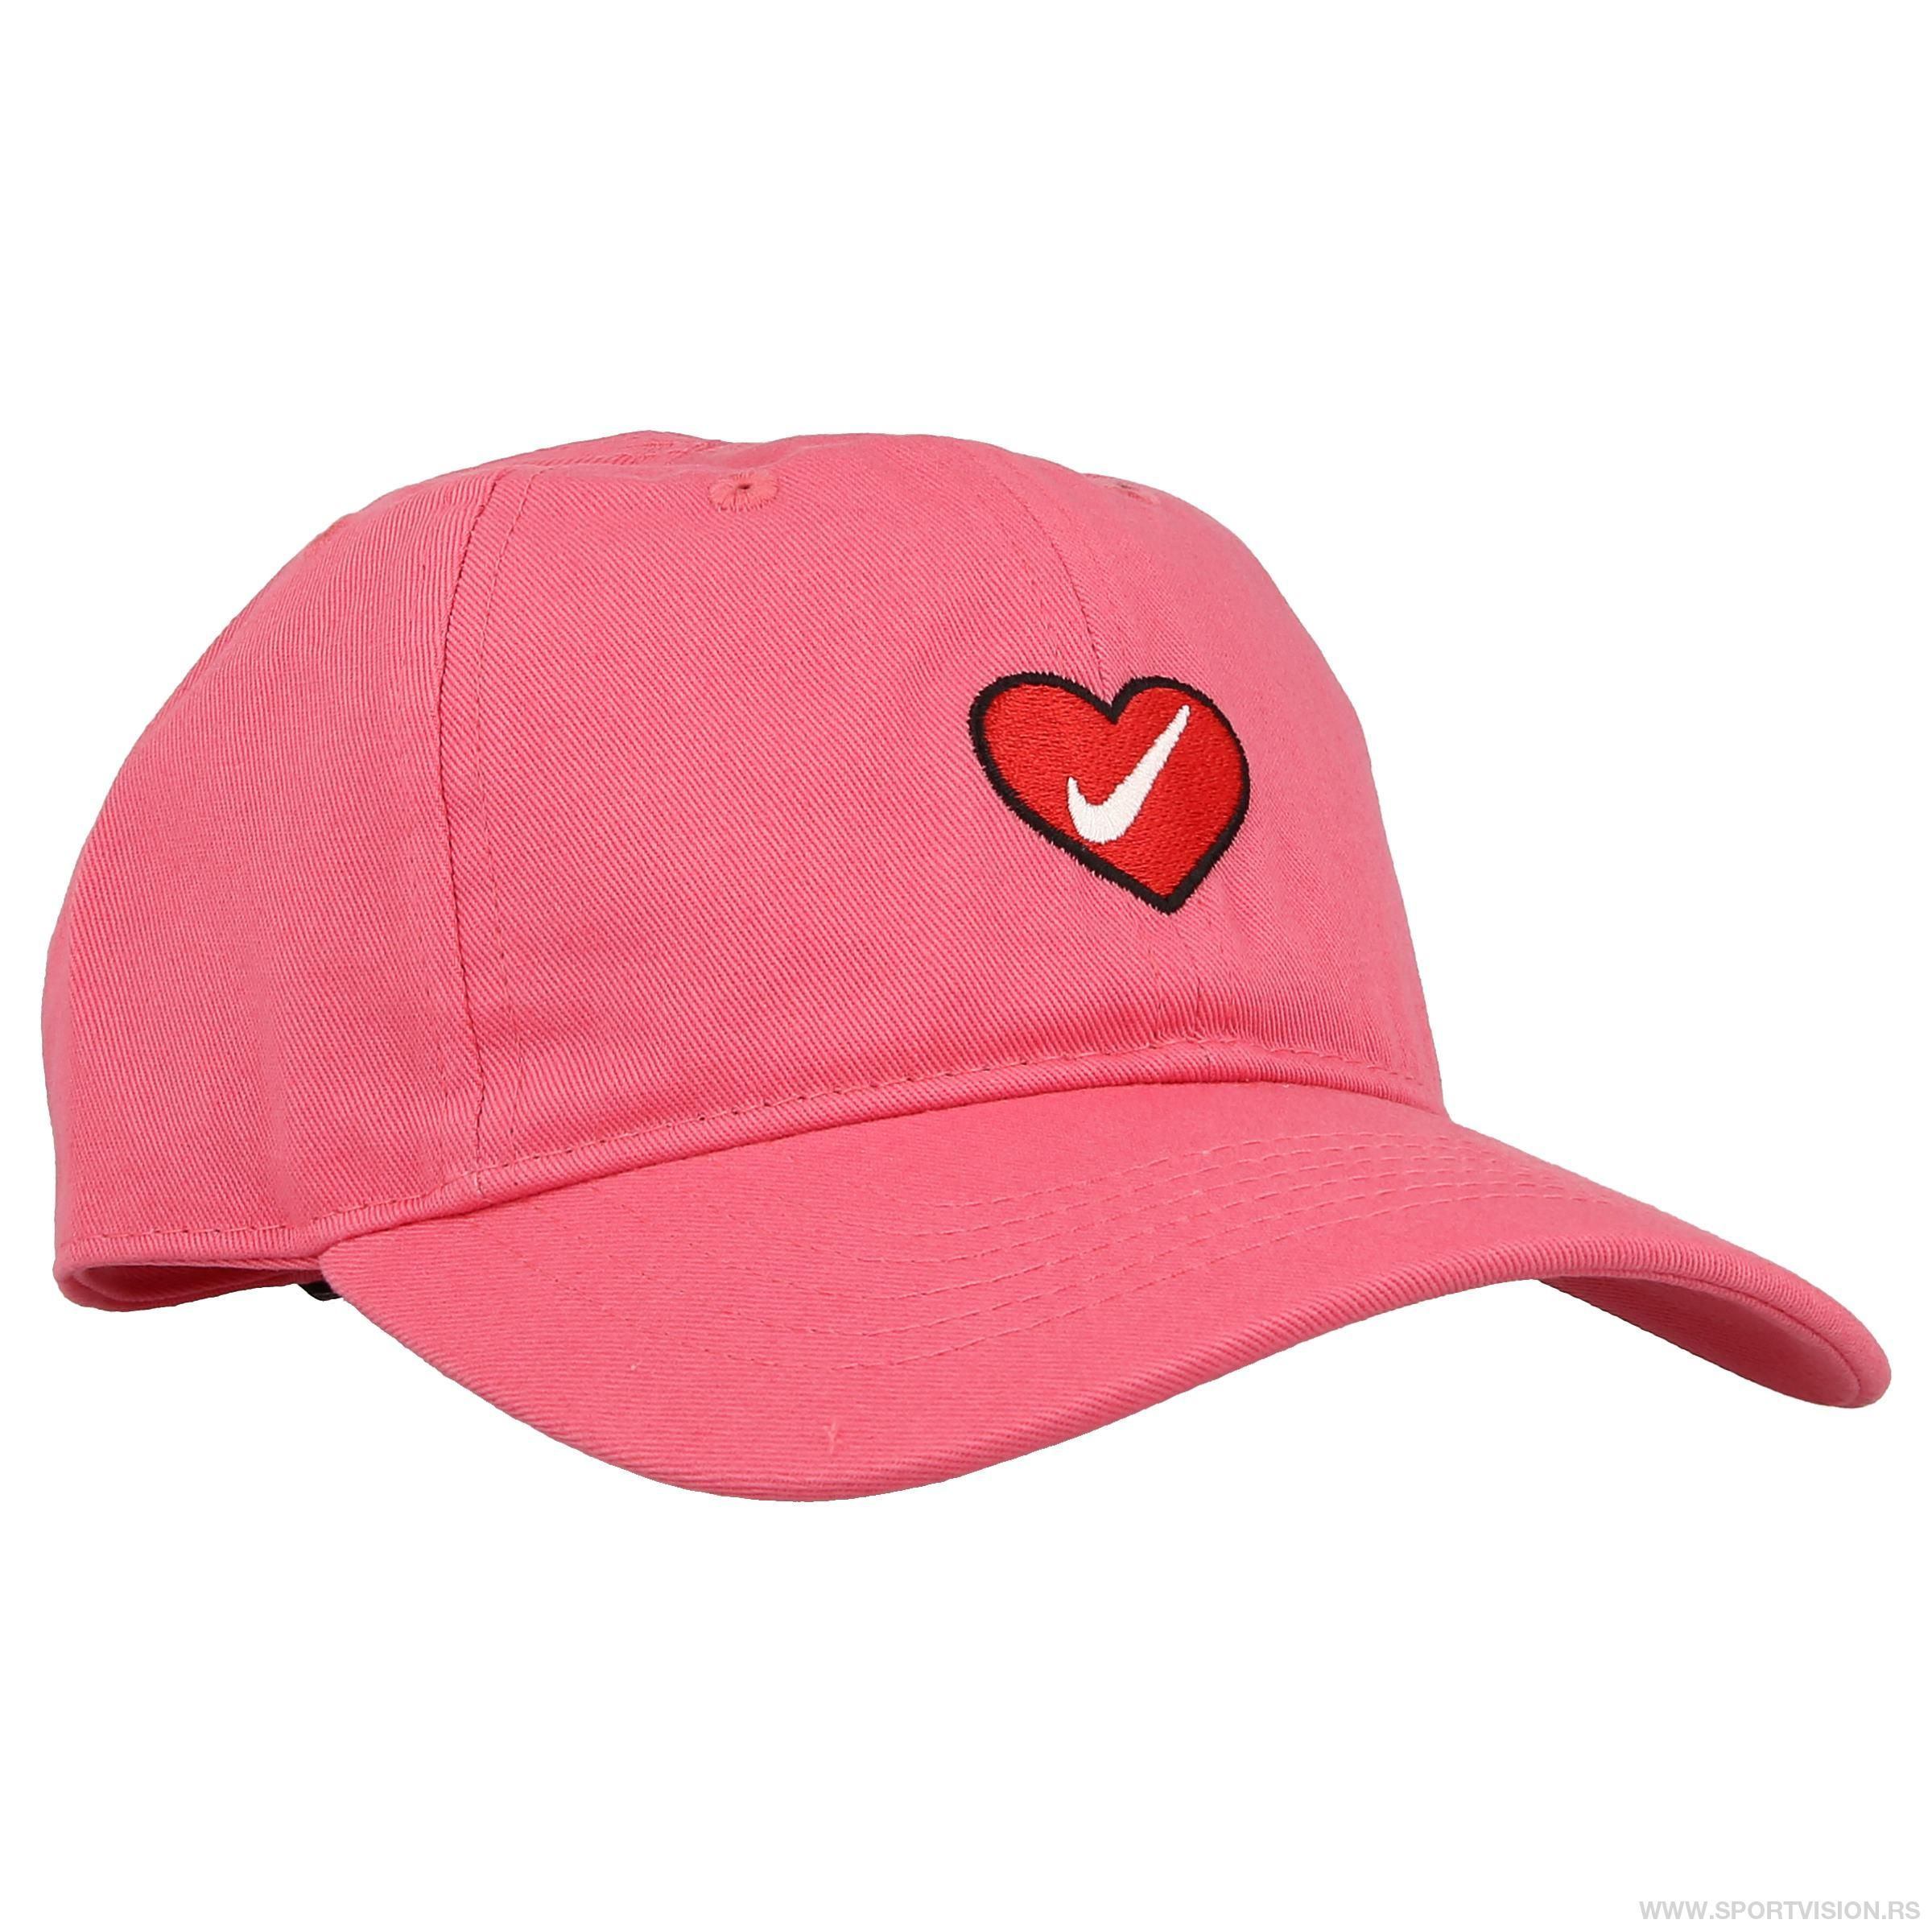 Nike nan react cap Cap, Nike, Baseball hats